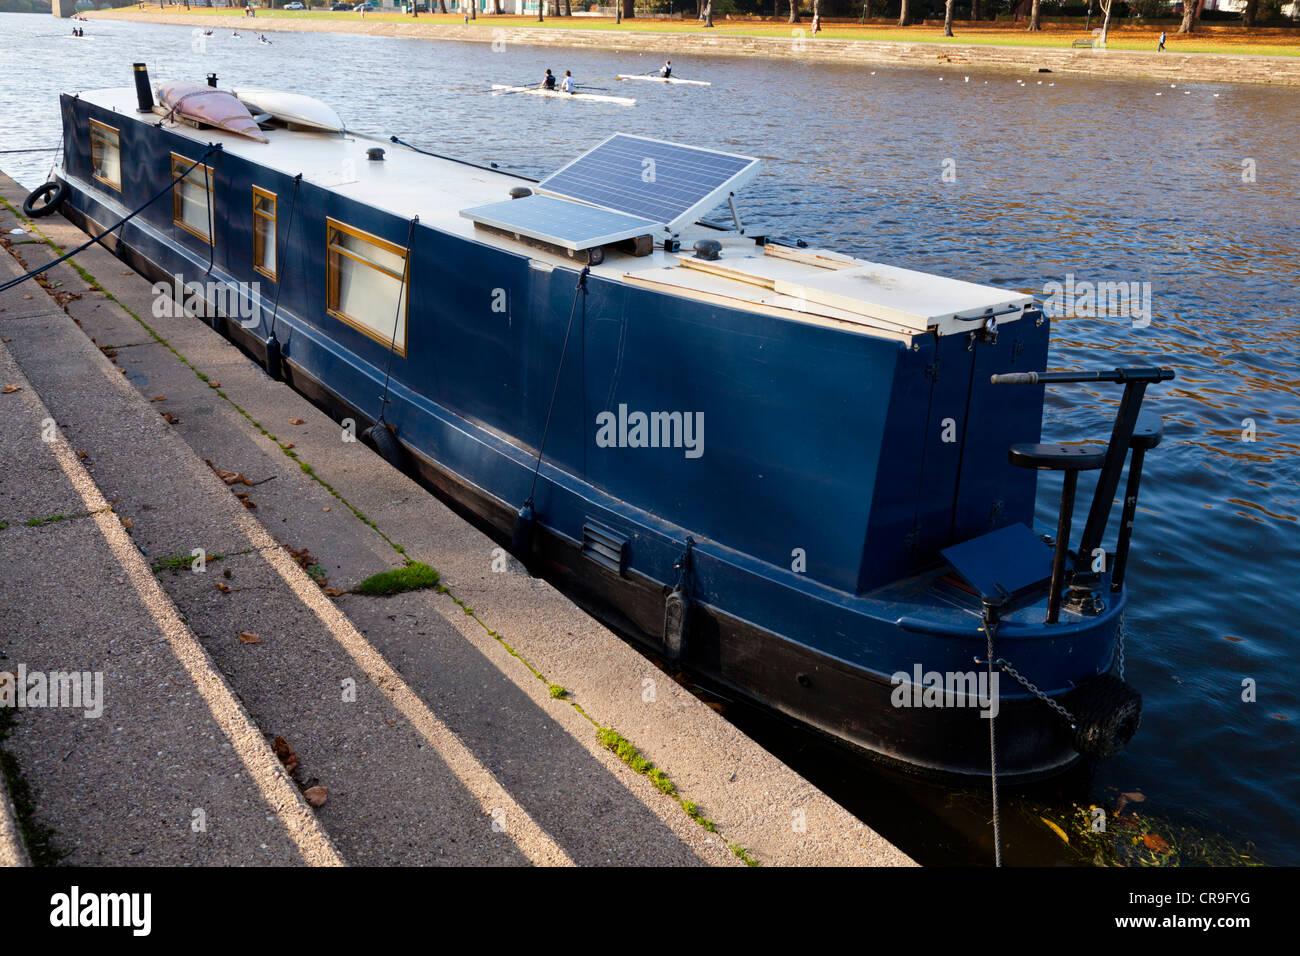 Narrowboat con un panel solar, el río Trent, Nottinghamshire, Inglaterra, Reino Unido. Imagen De Stock